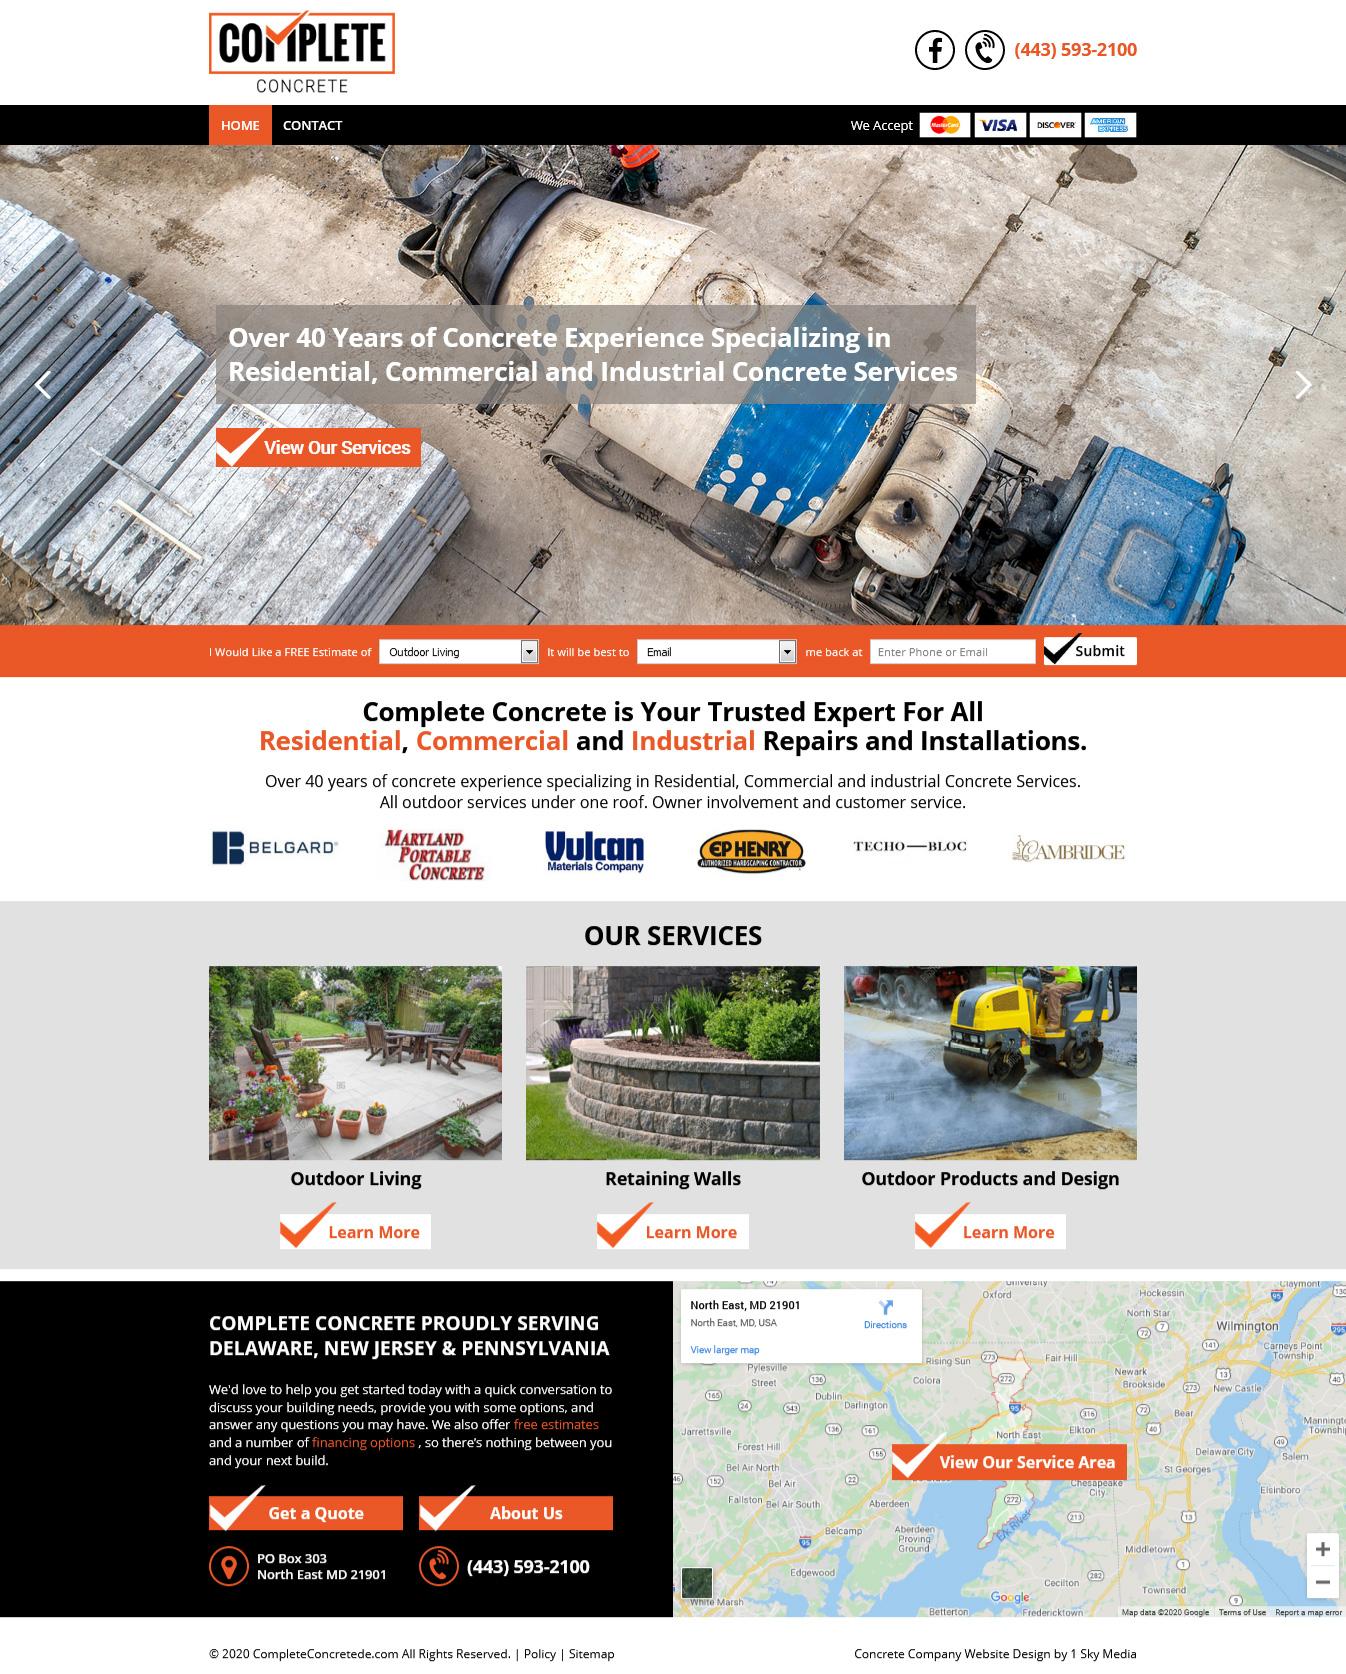 Complete Concrete Website Design